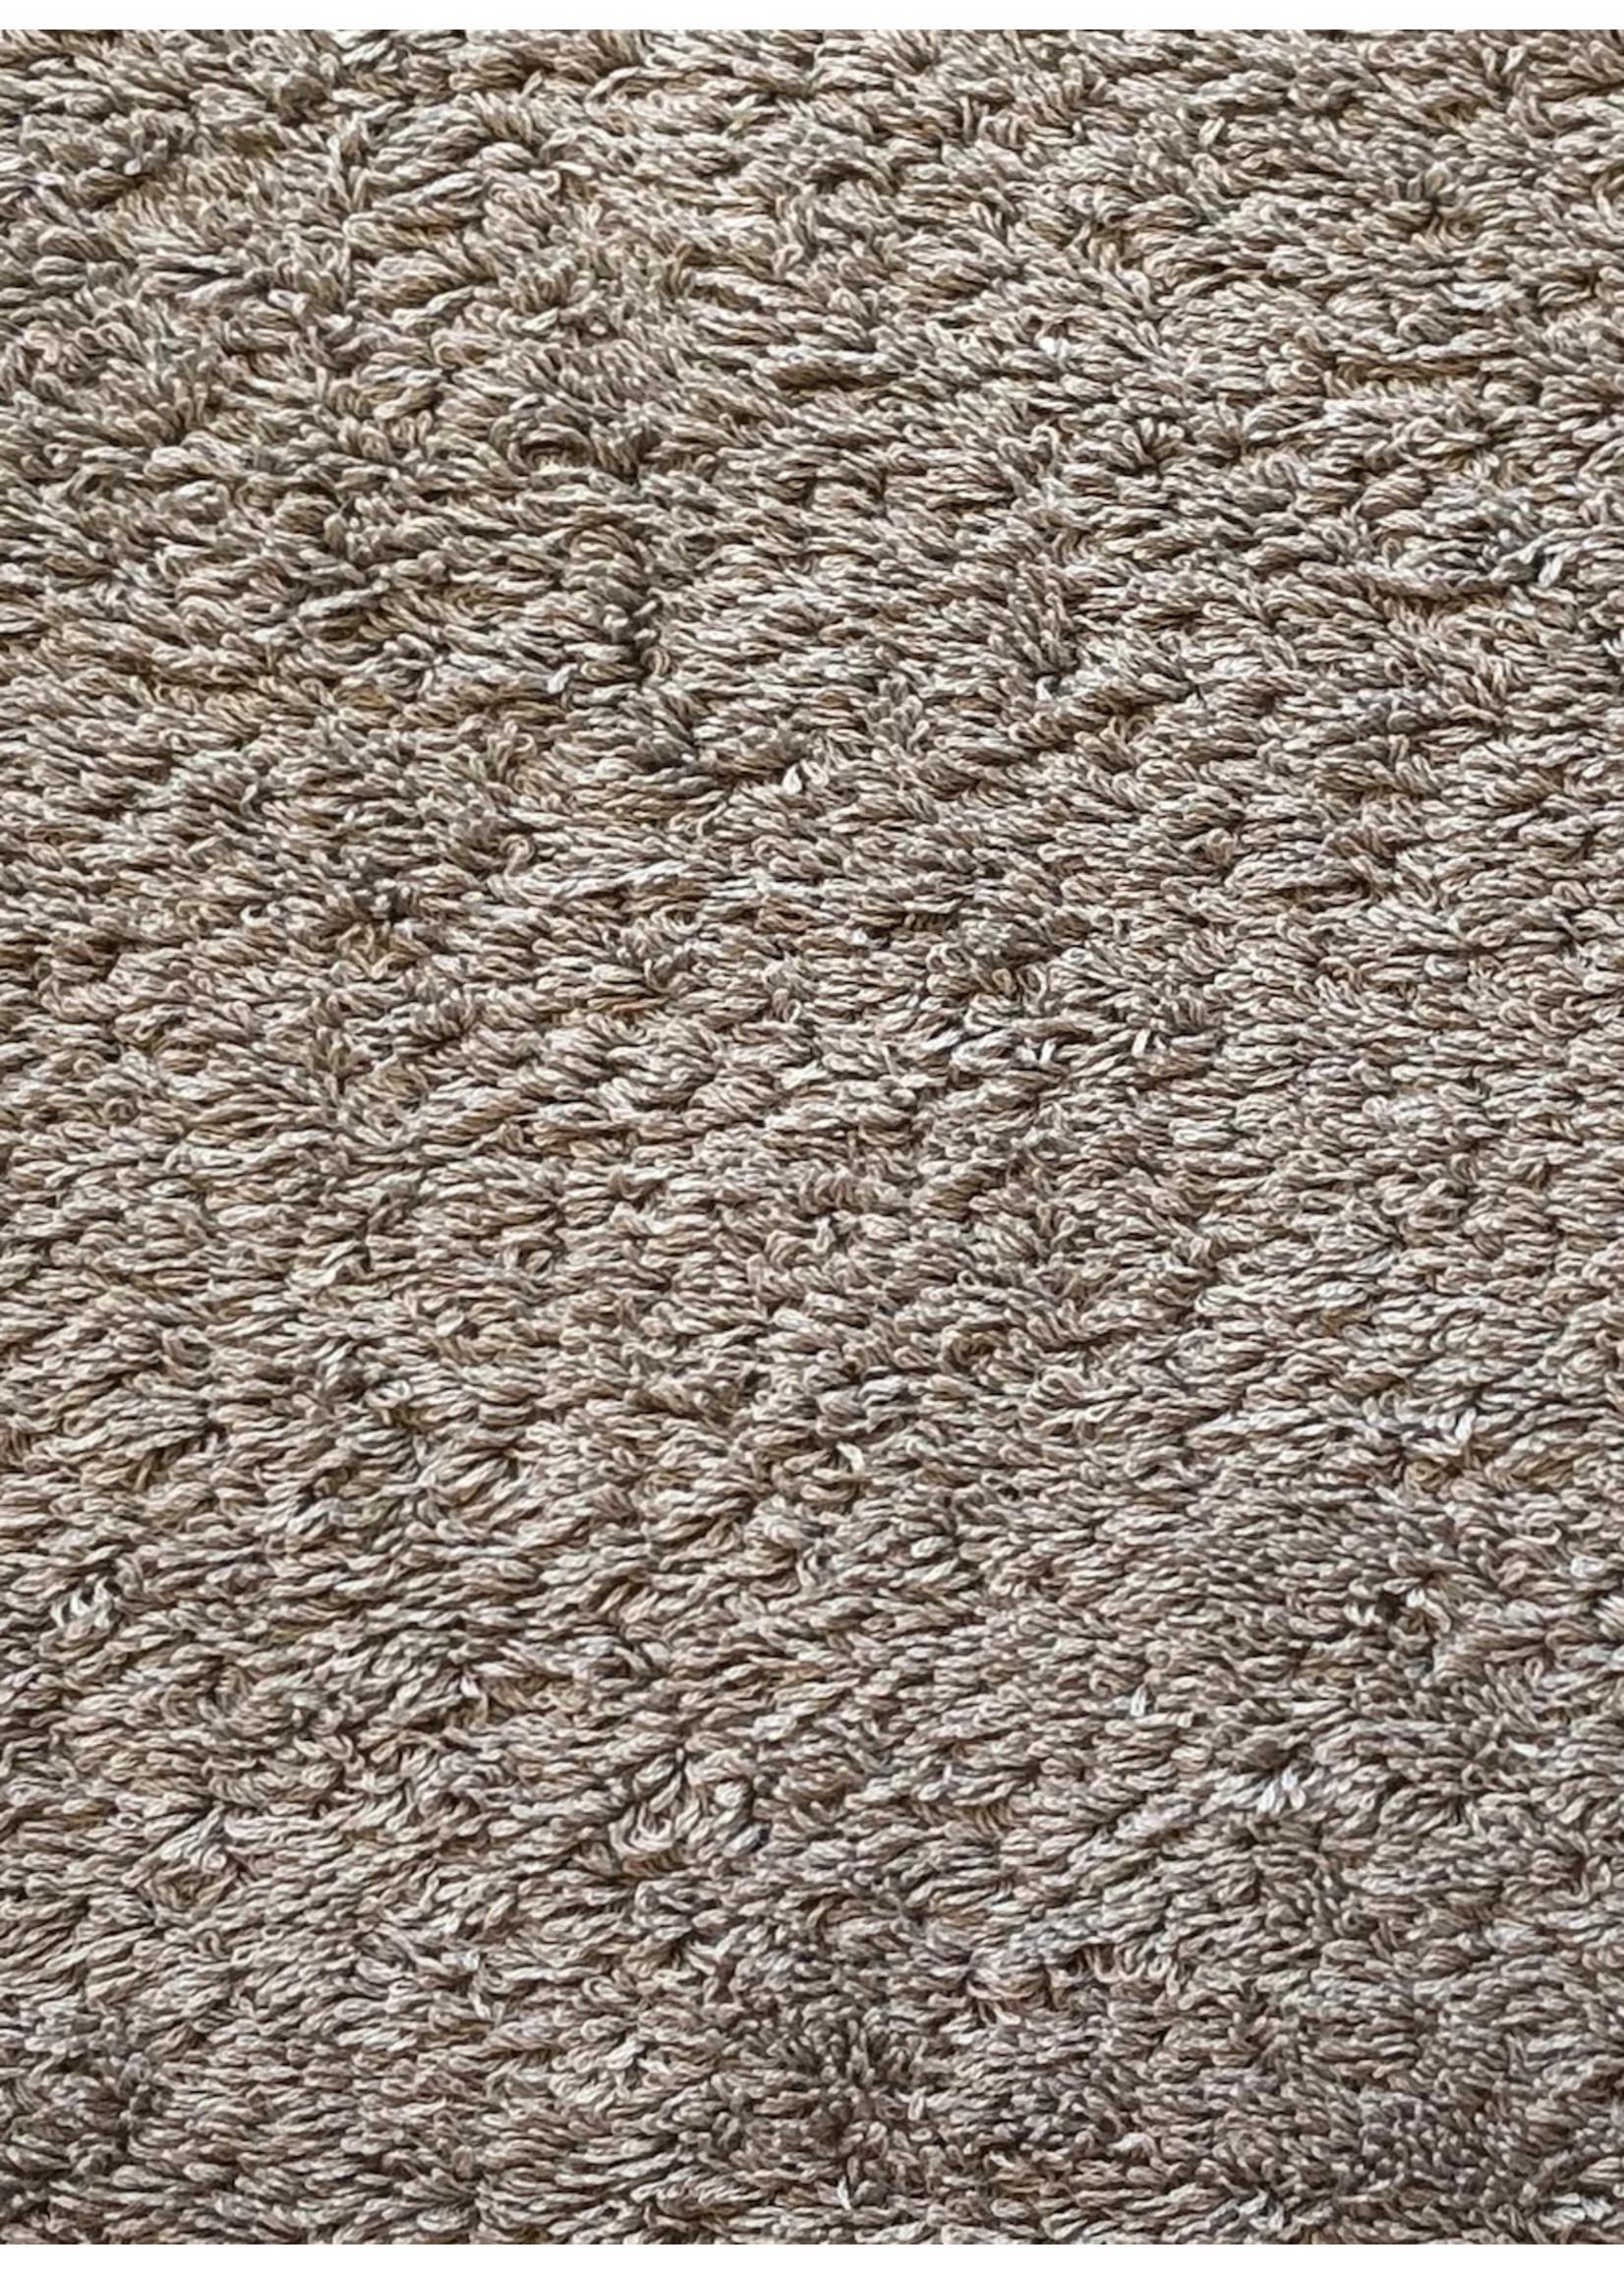 Abyss & Habidecor Super Pile Linen Towels